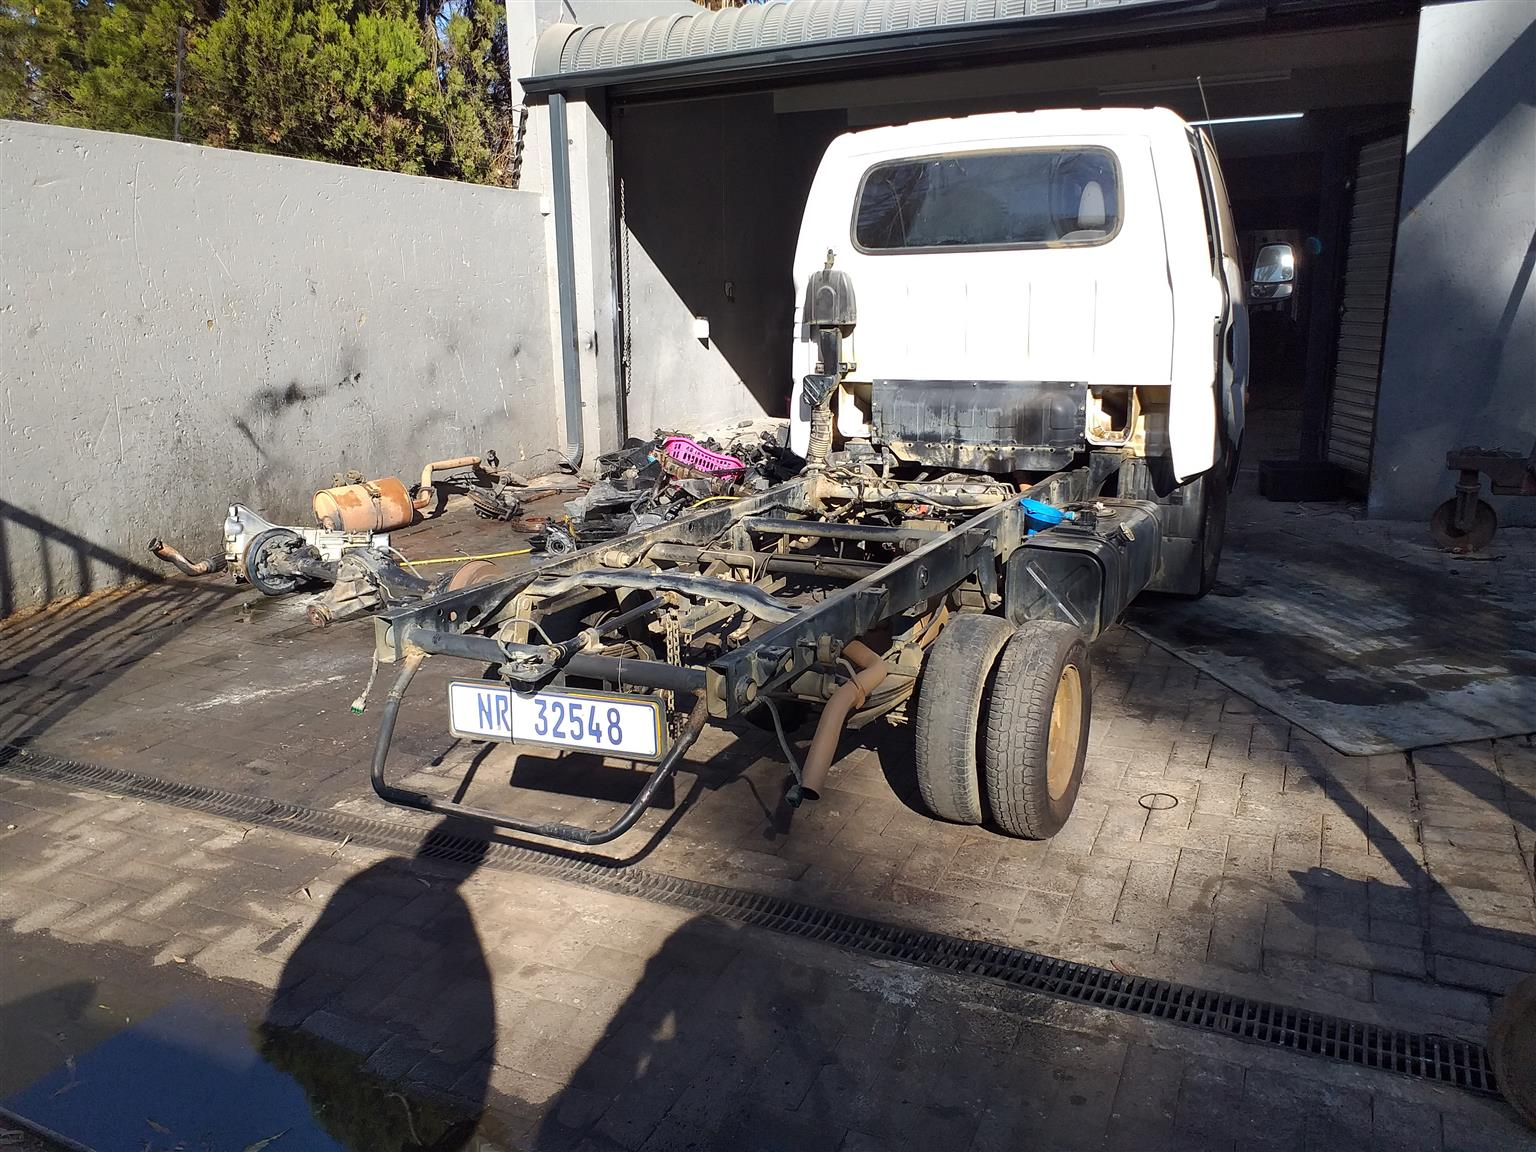 Kia K2700 stripping for spares